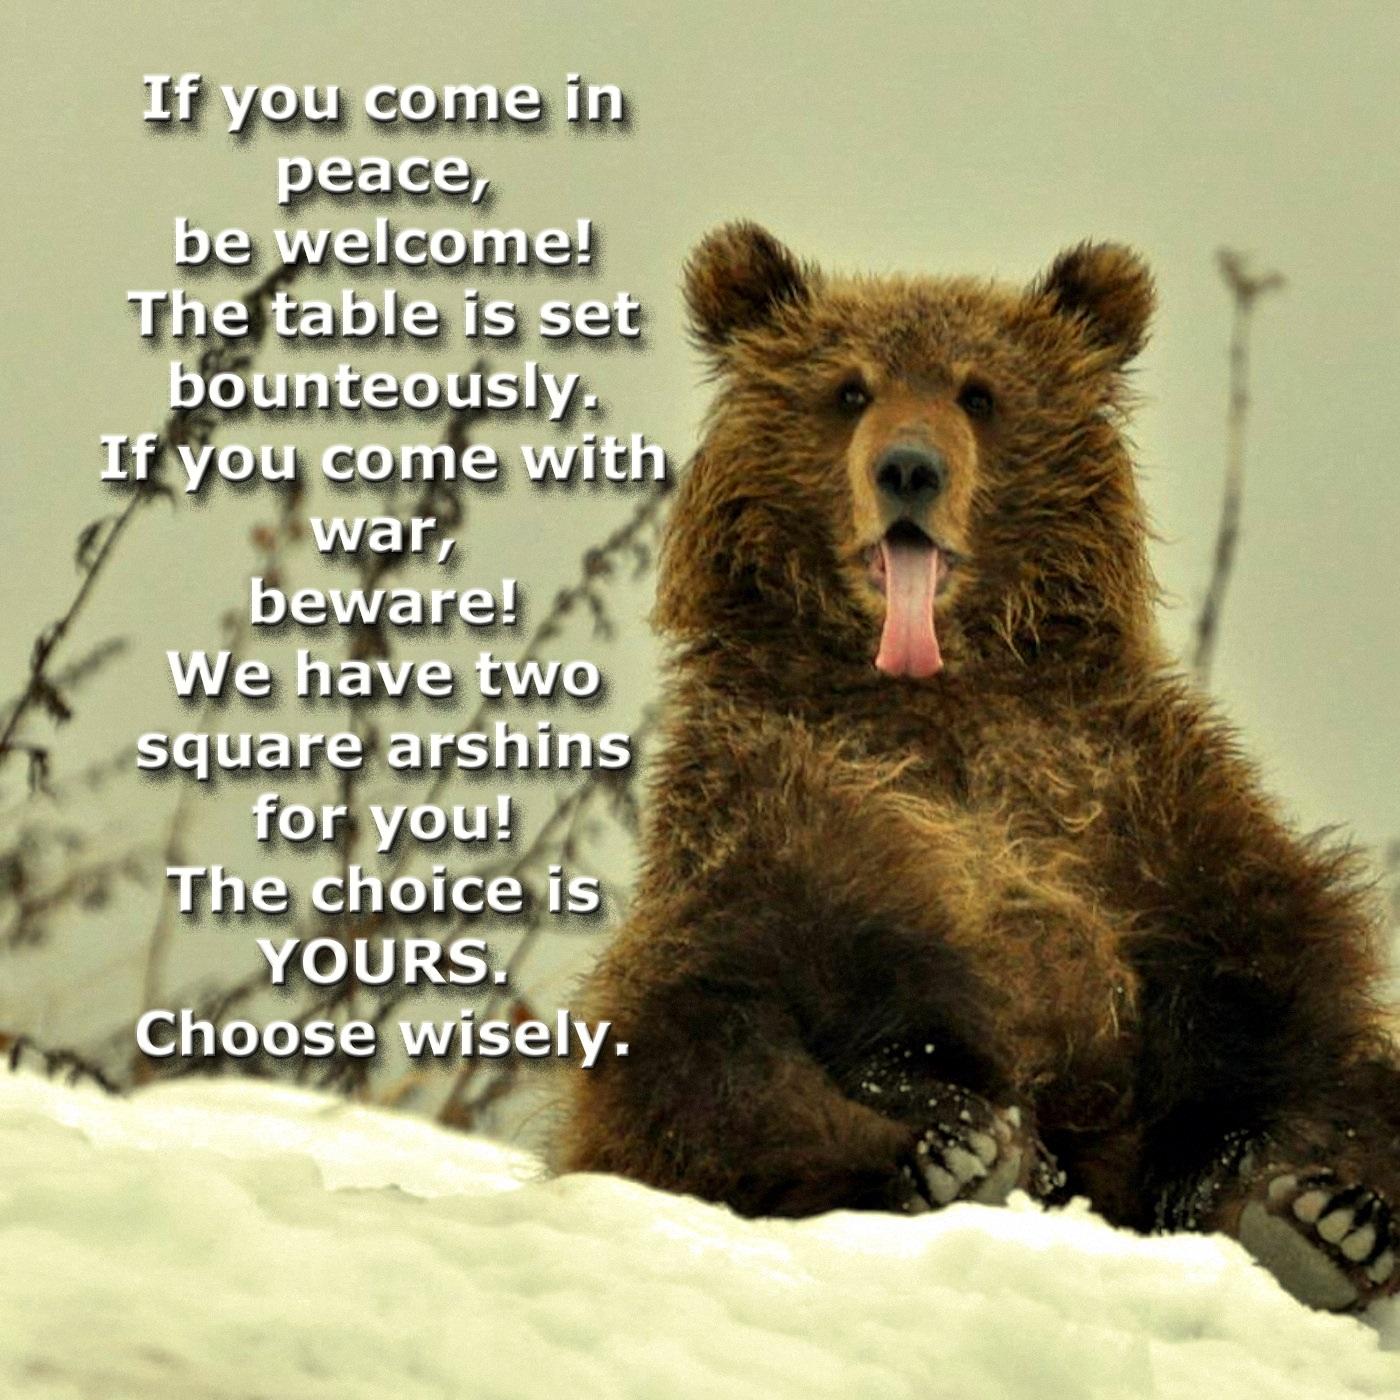 00-russian-bear-war-and-peace-100117